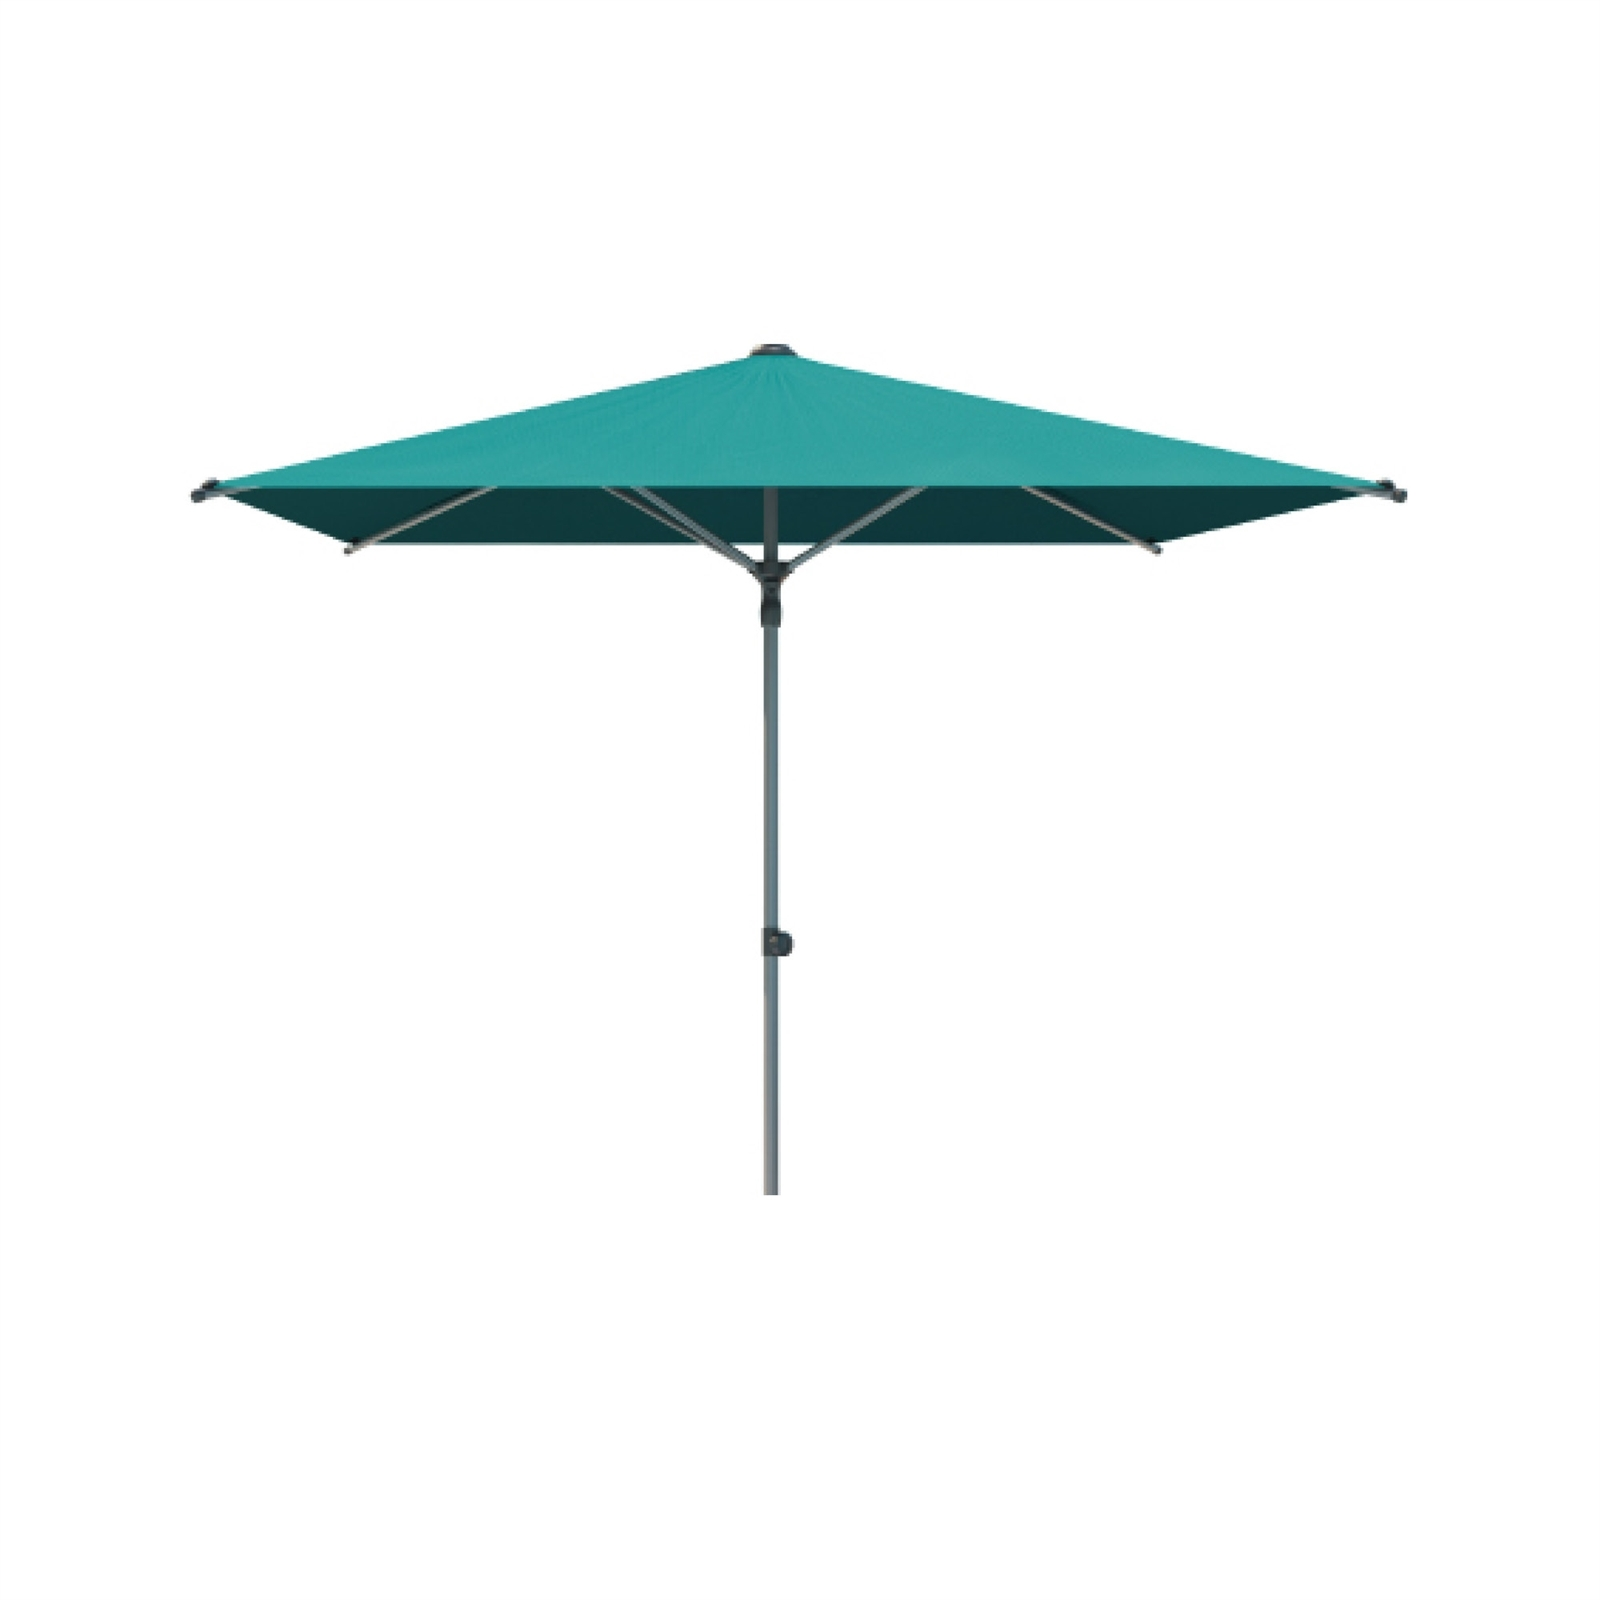 Coolaroo 2.7m Aqua Torquay Square Market Umbrella